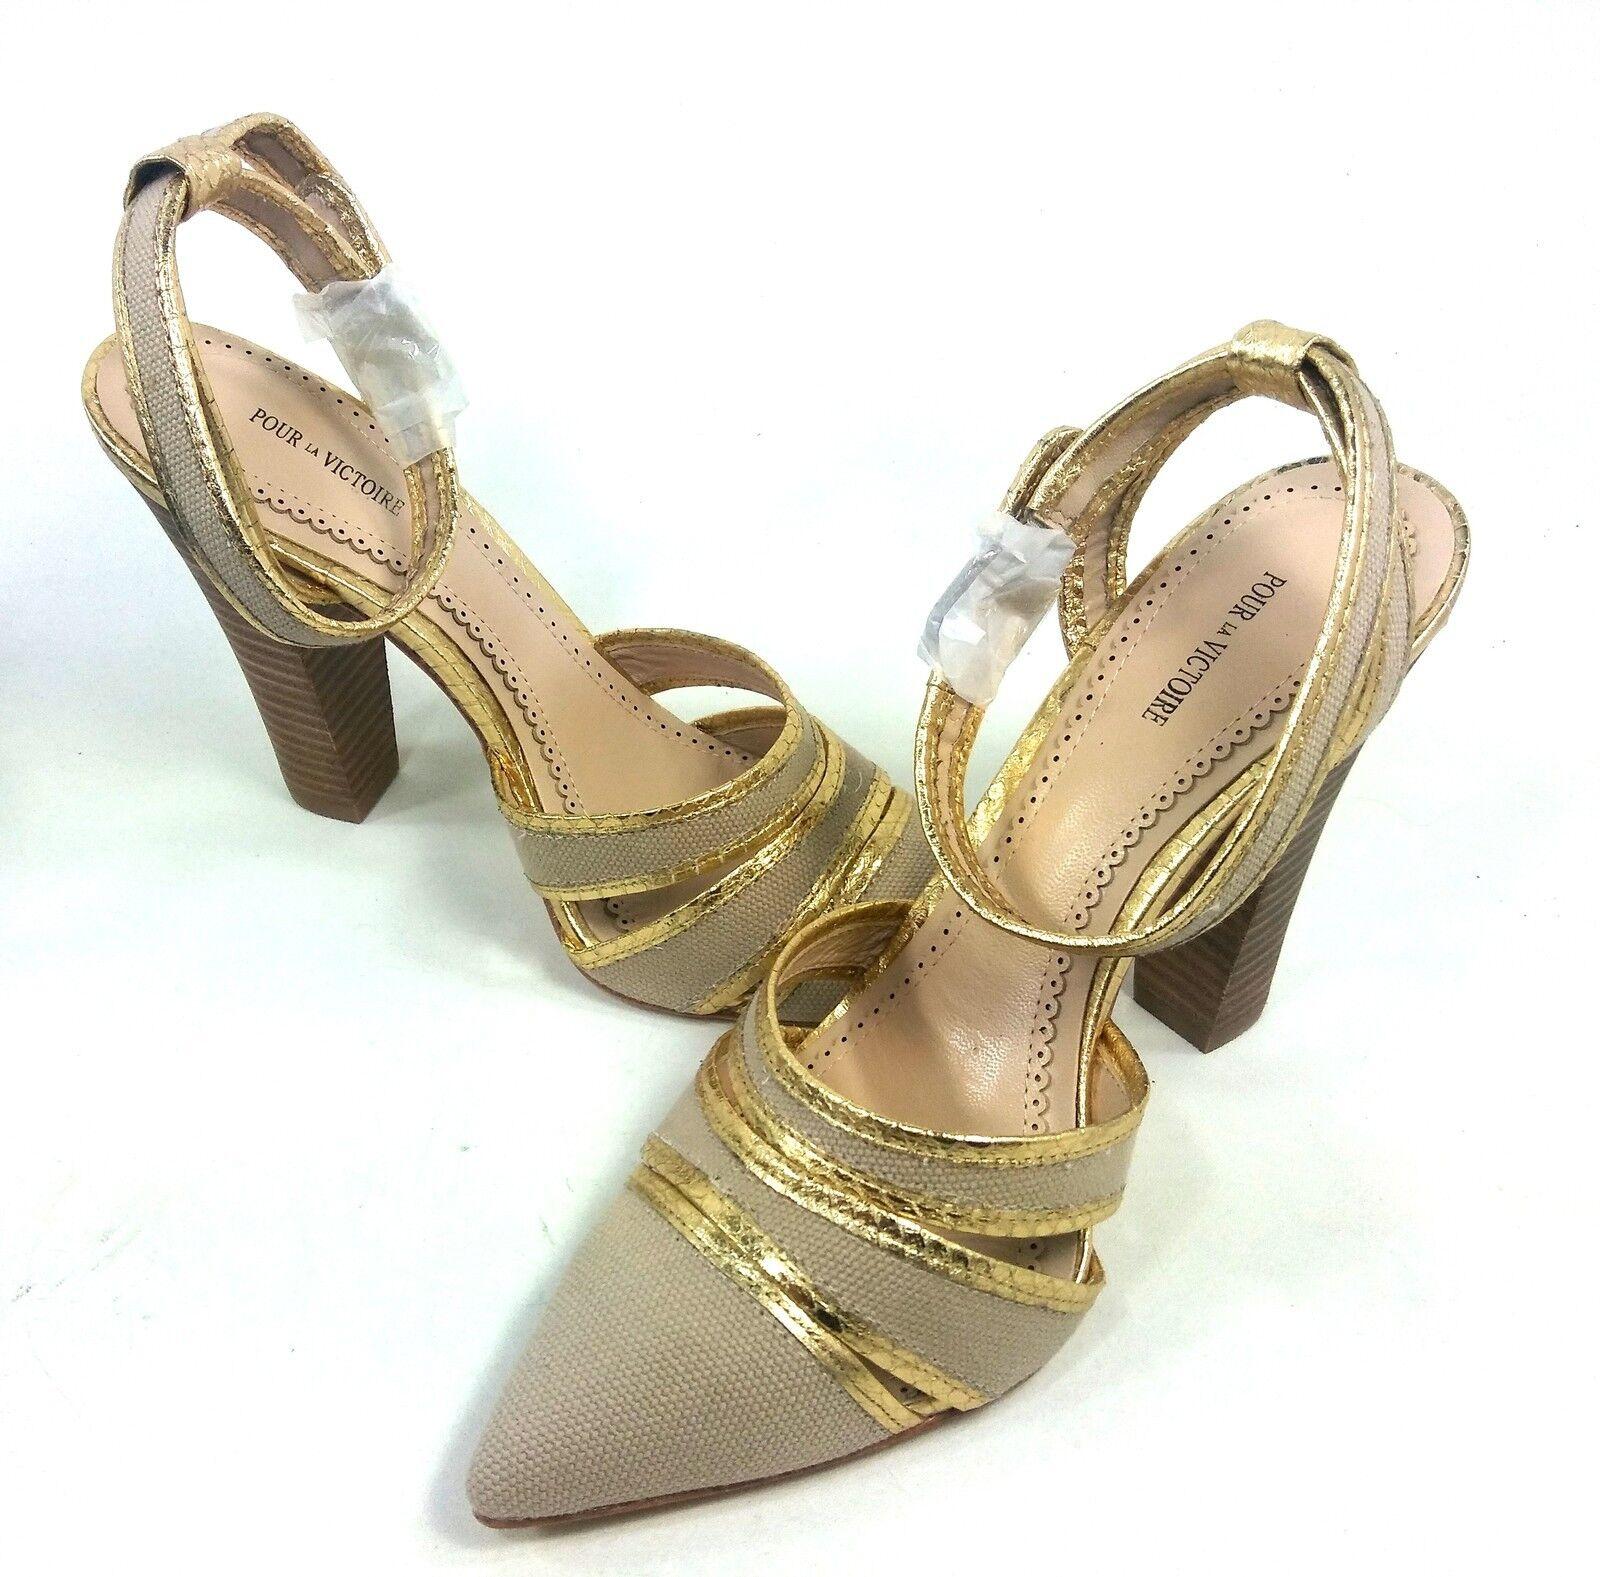 Pour La Victoire, Kiran 2 Bomba, mujeres, oro, Cuero, US US US tamaño 9 M, Euro 39, nuevo  barato y de moda